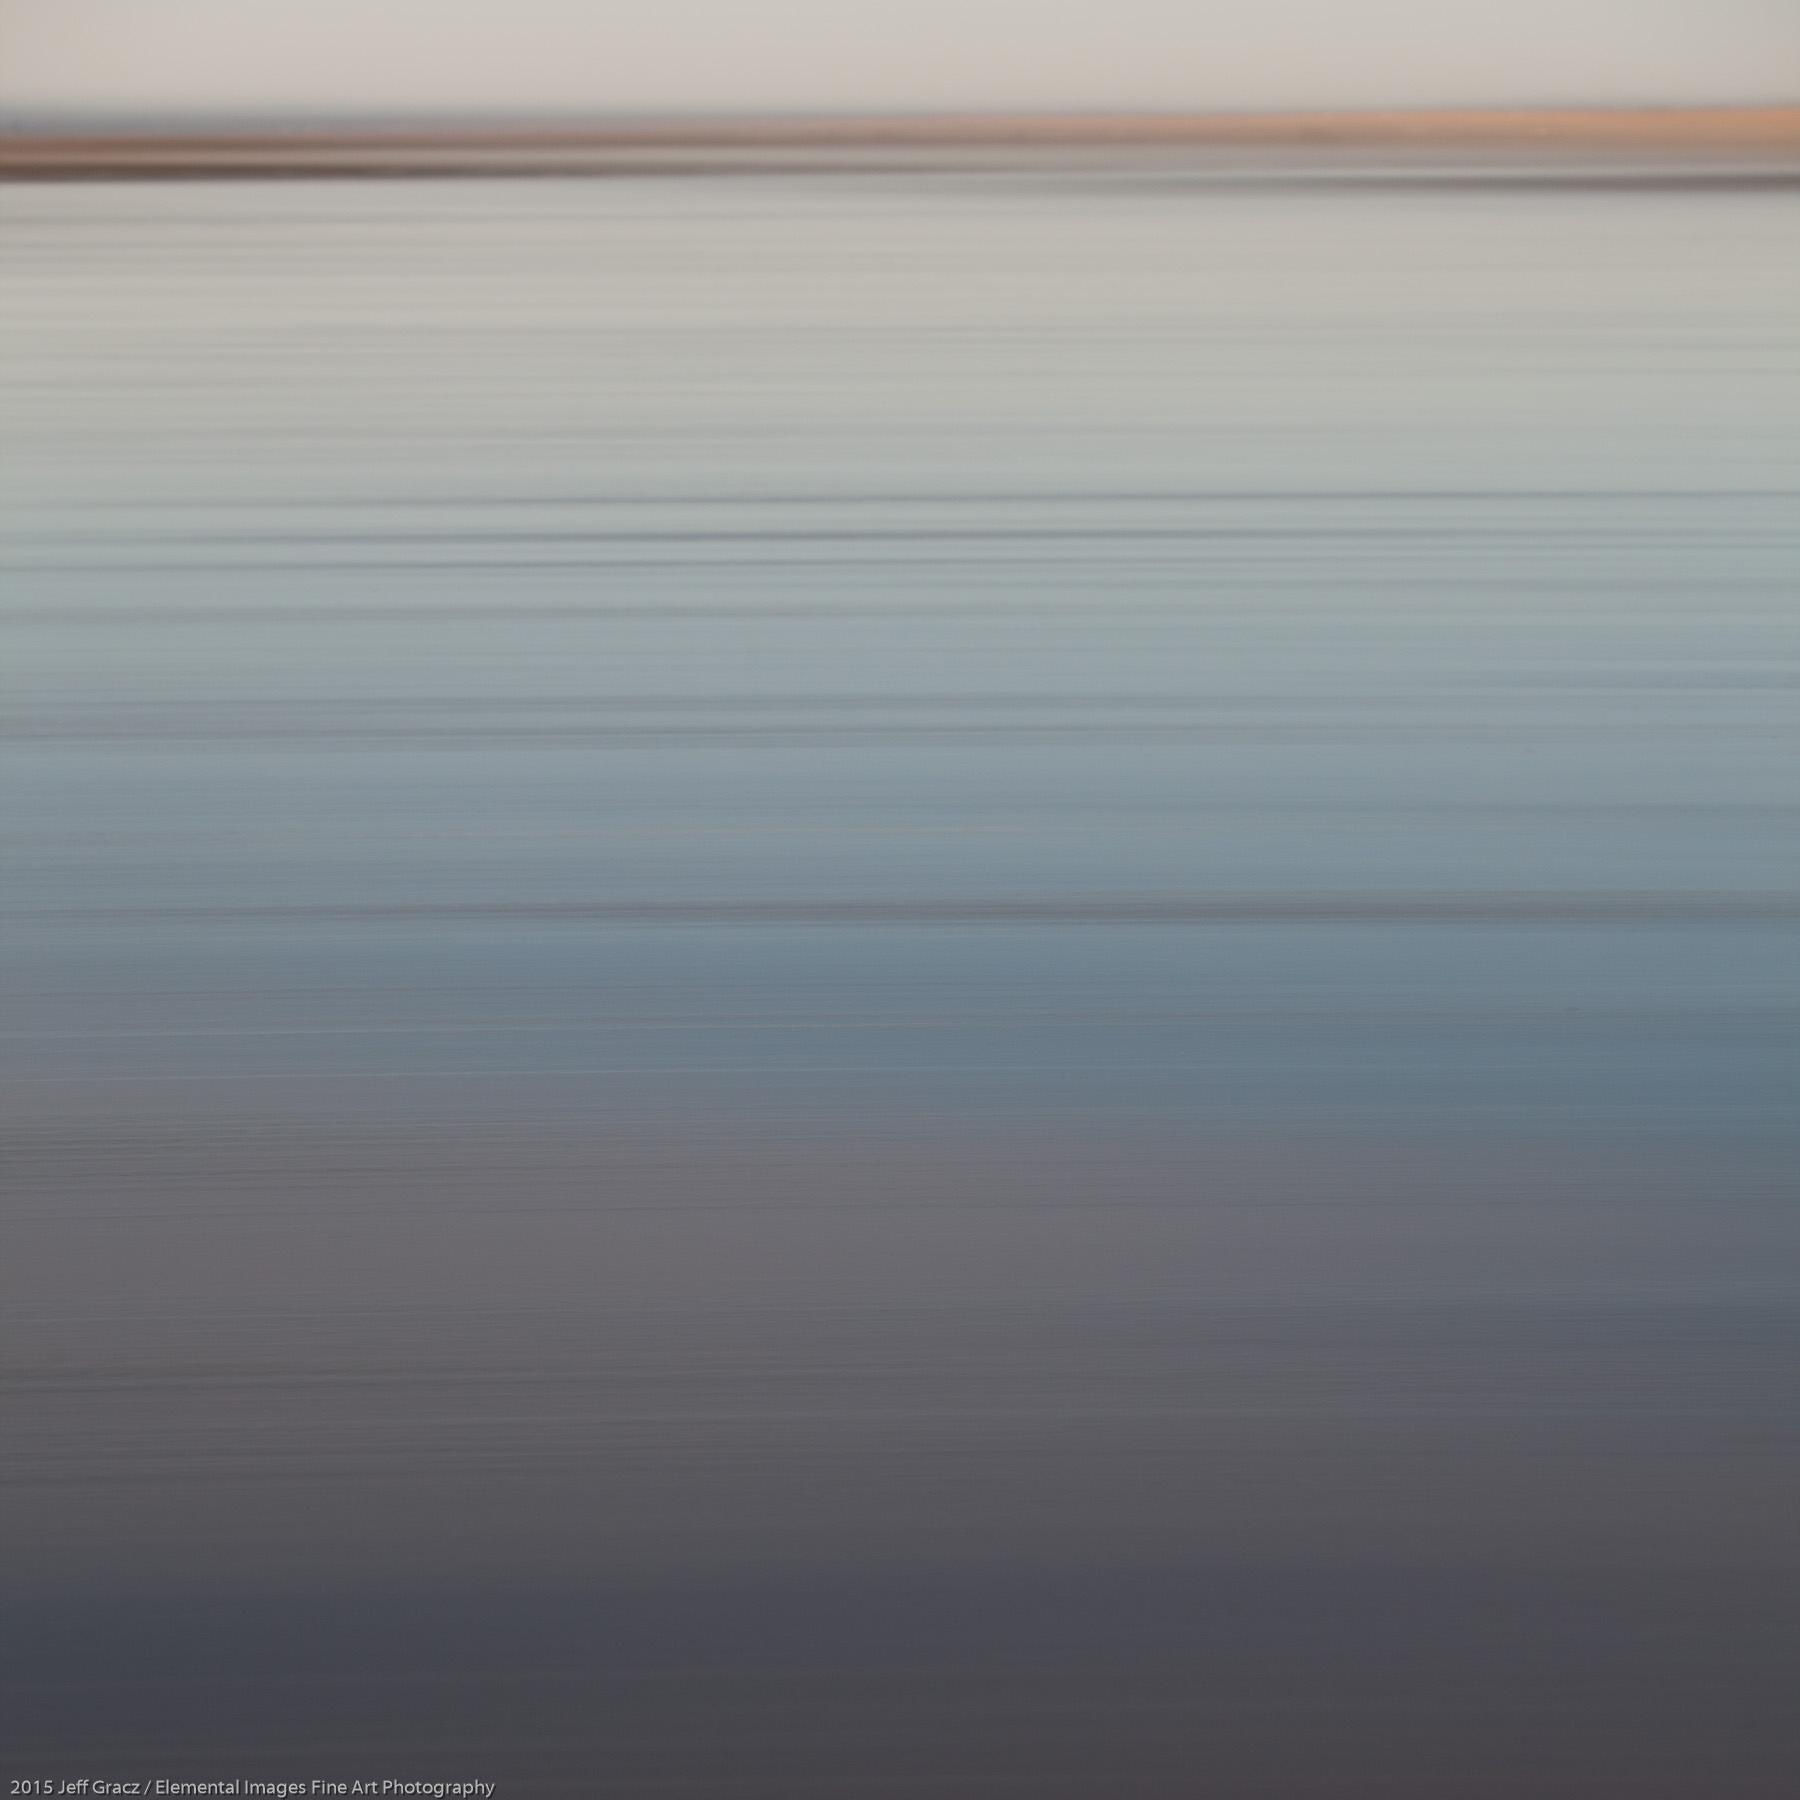 Sea and Sky XLVIII   Long Beach   WA   USA - © 2015 Jeff Gracz / Elemental Images Fine Art Photography - All Rights Reserved Worldwide